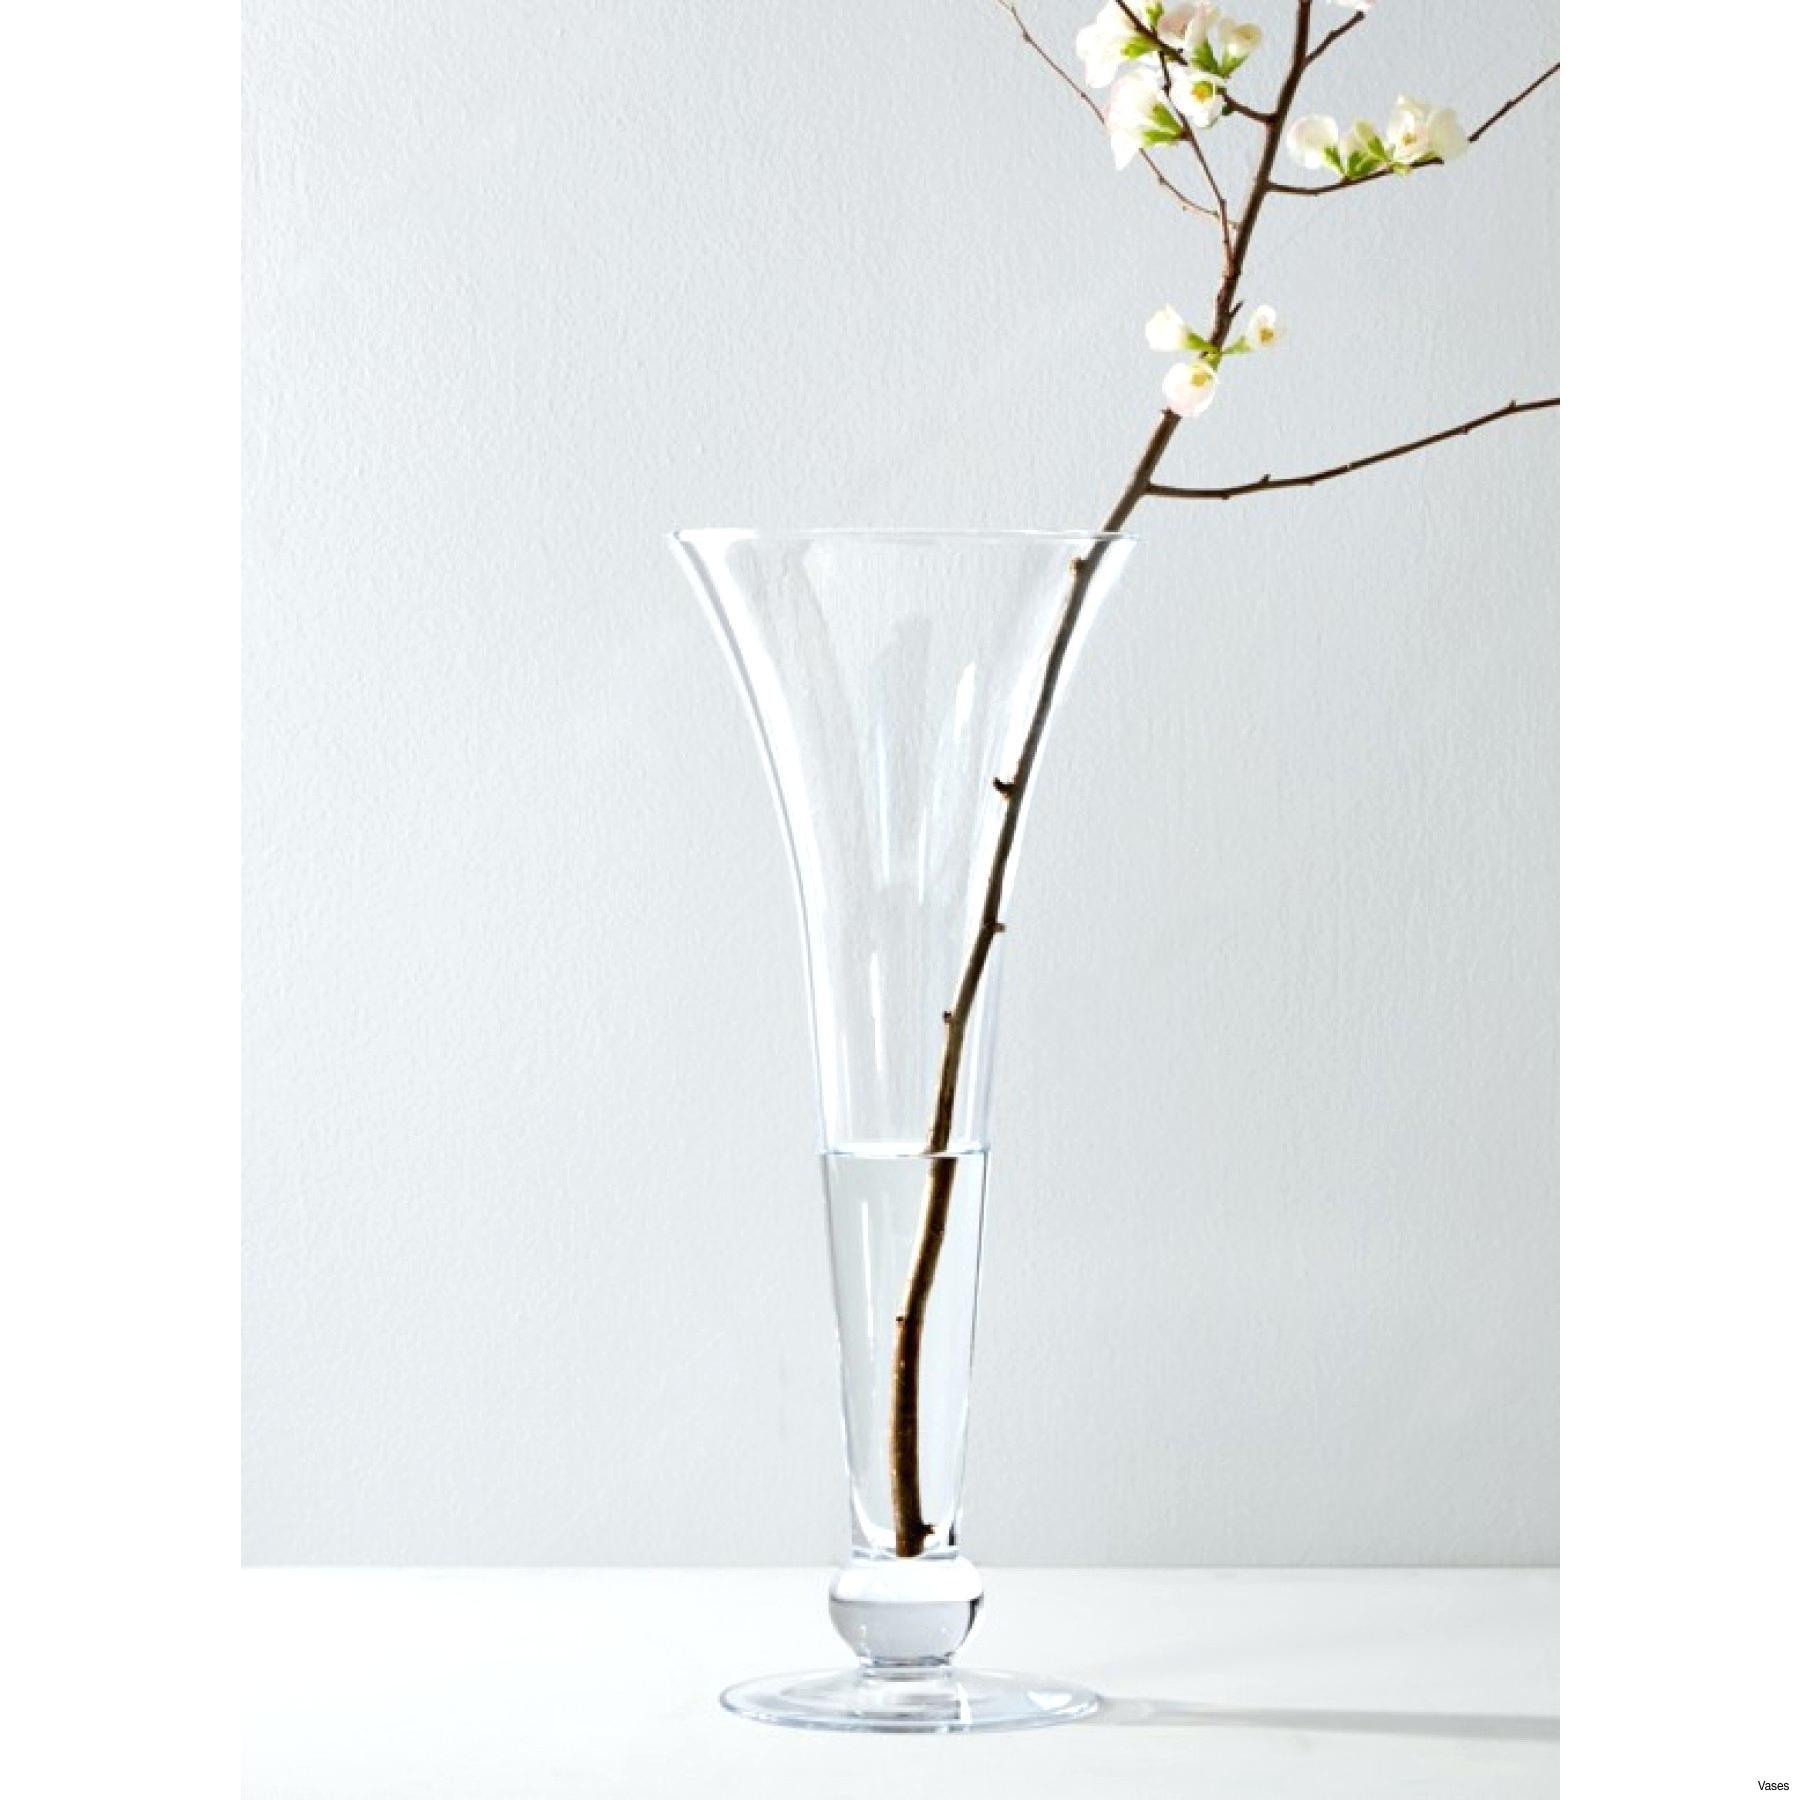 lundberg art glass vase of 15 elegant glass trumpet vase bogekompresorturkiye com with regard to plastic trumpet vase bulk centerpieces diy weddingh vases glass for inspiration gold centerpieces